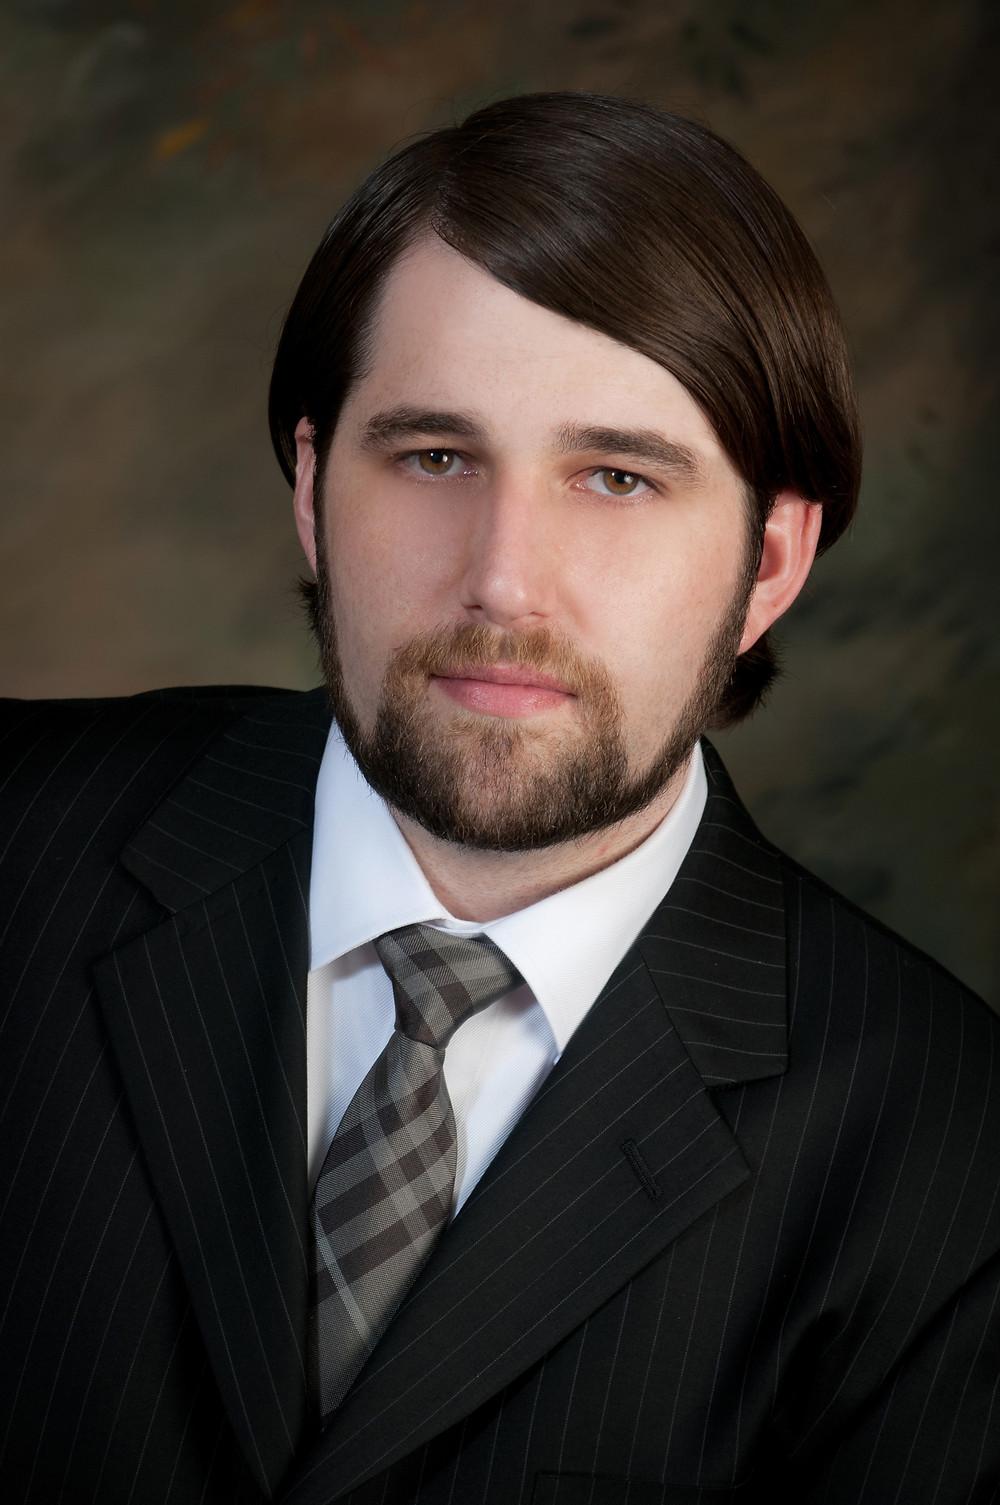 Ian R. Anderson - Host